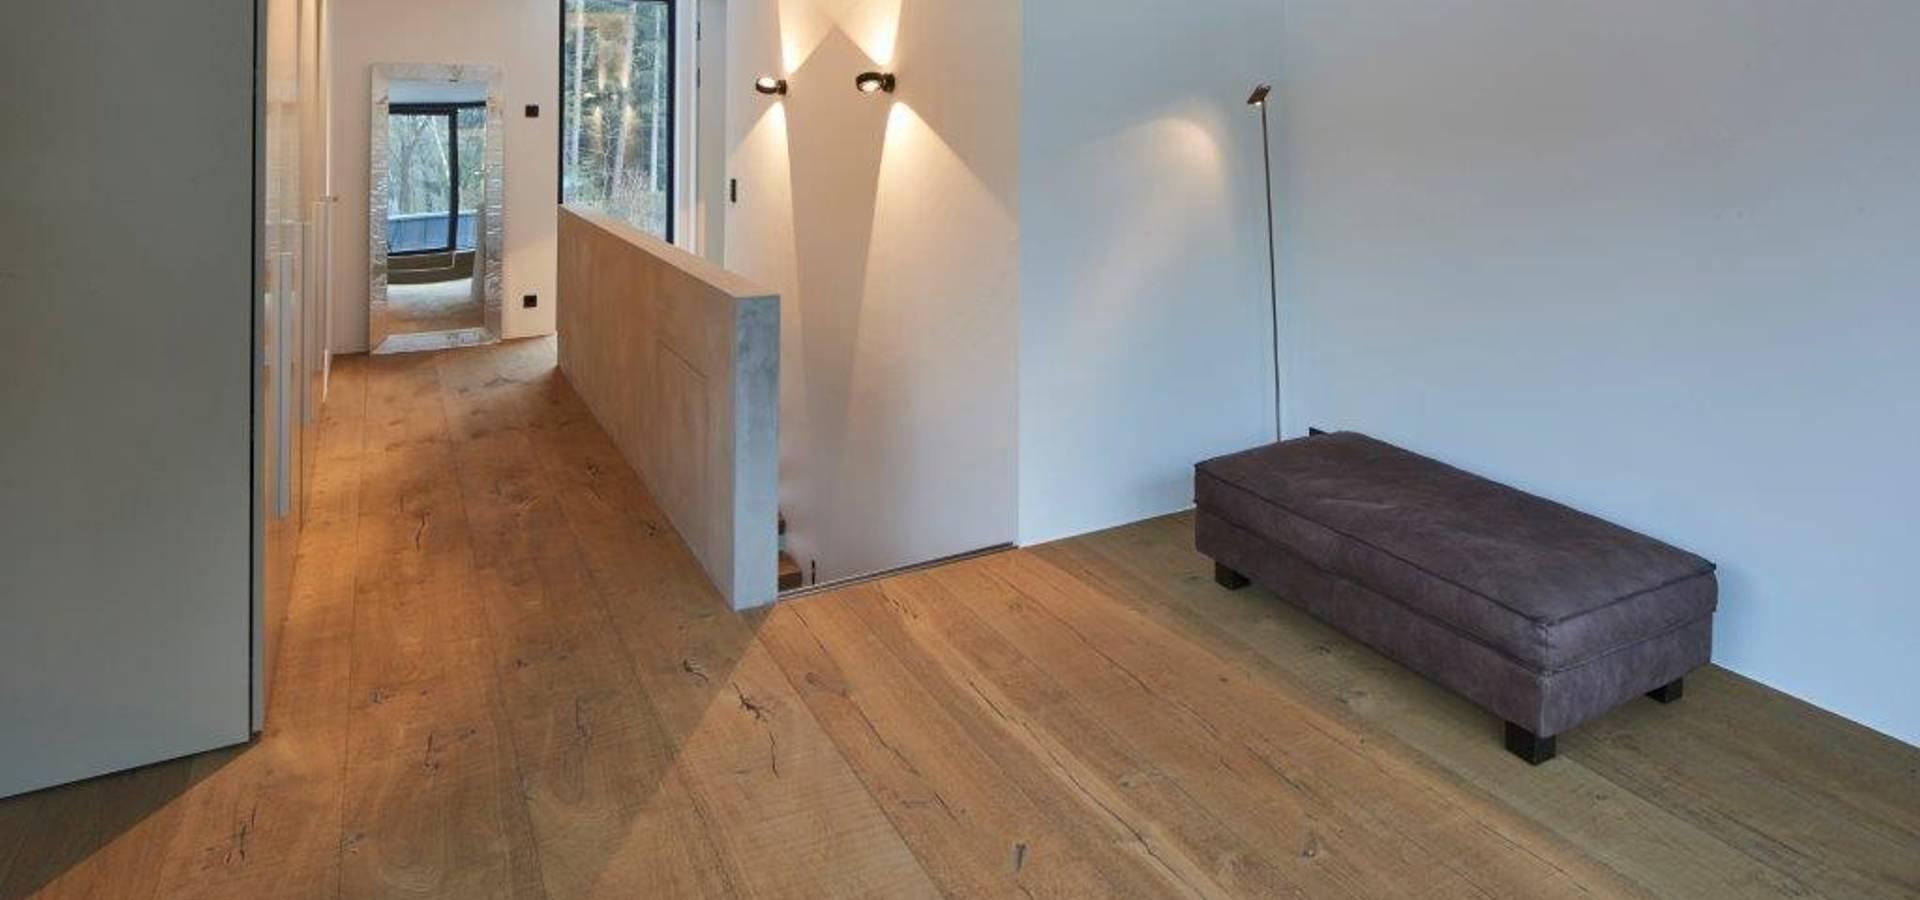 parkett leuthe gmbh bodenbel ge in rosenheim homify. Black Bedroom Furniture Sets. Home Design Ideas